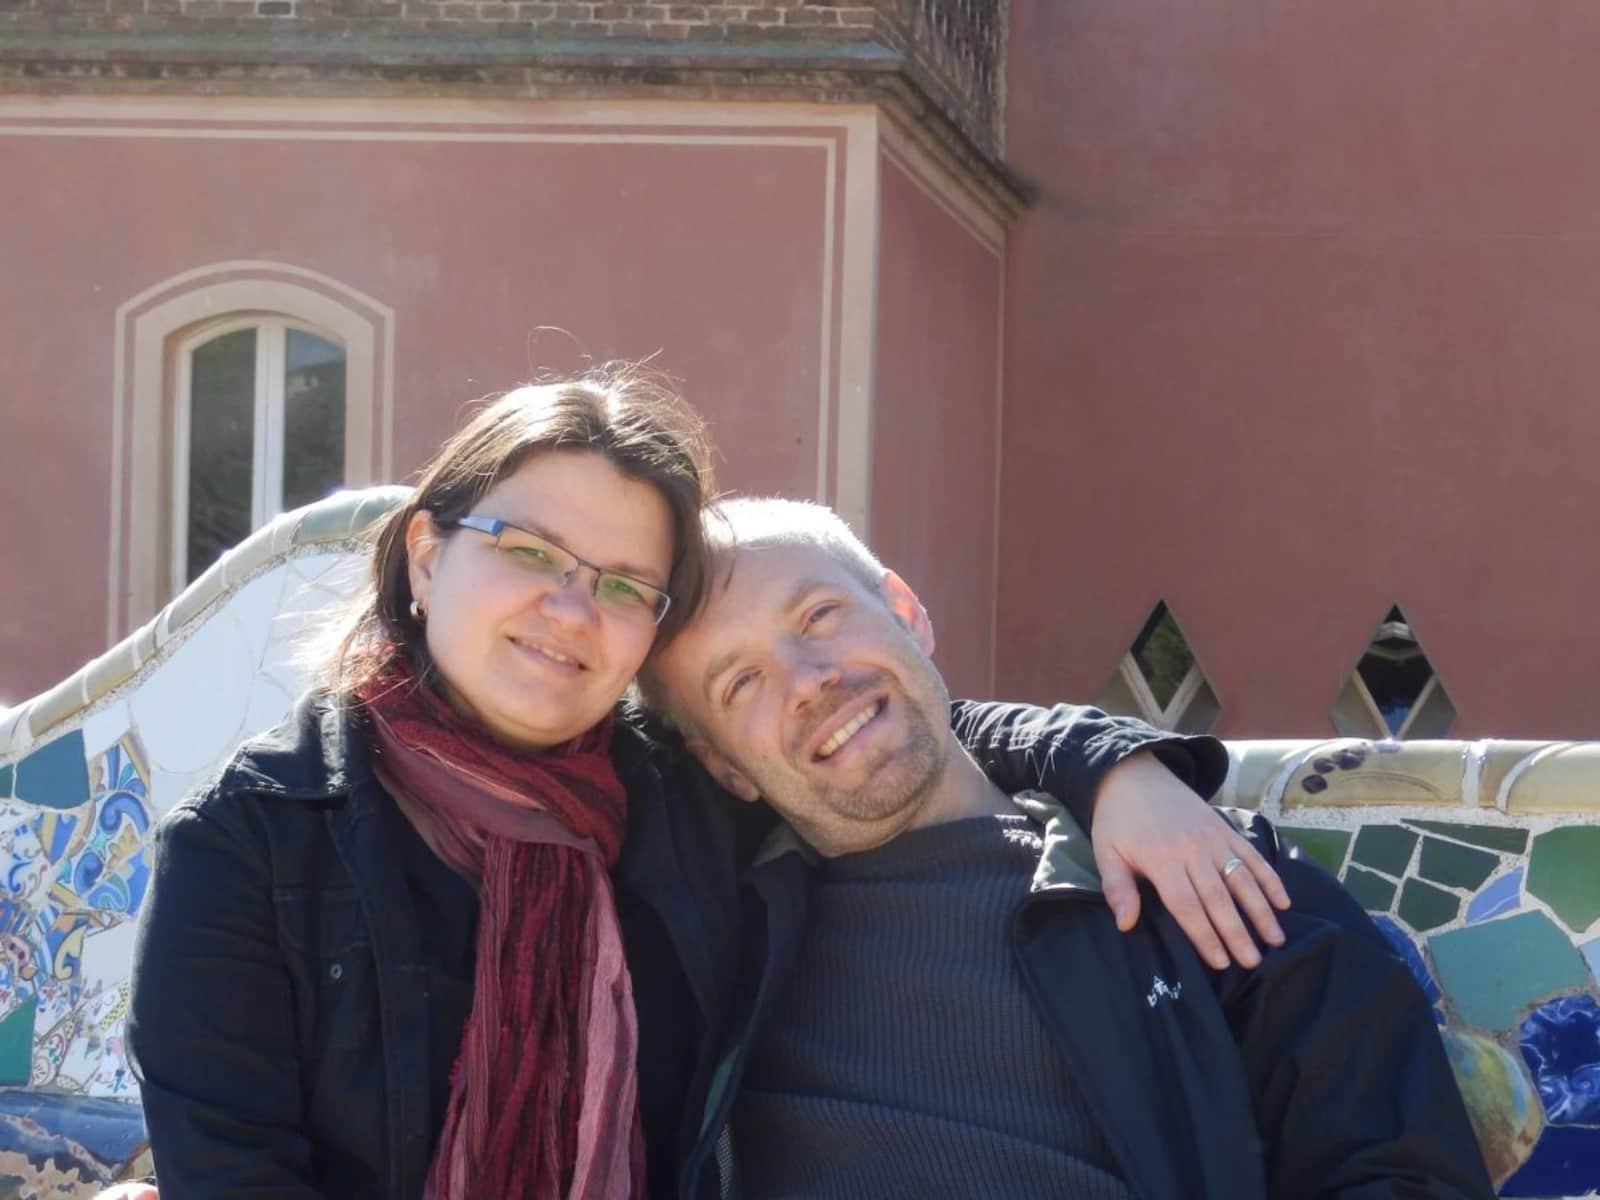 Matthias & Kristina from 100 Mile House, British Columbia, Canada